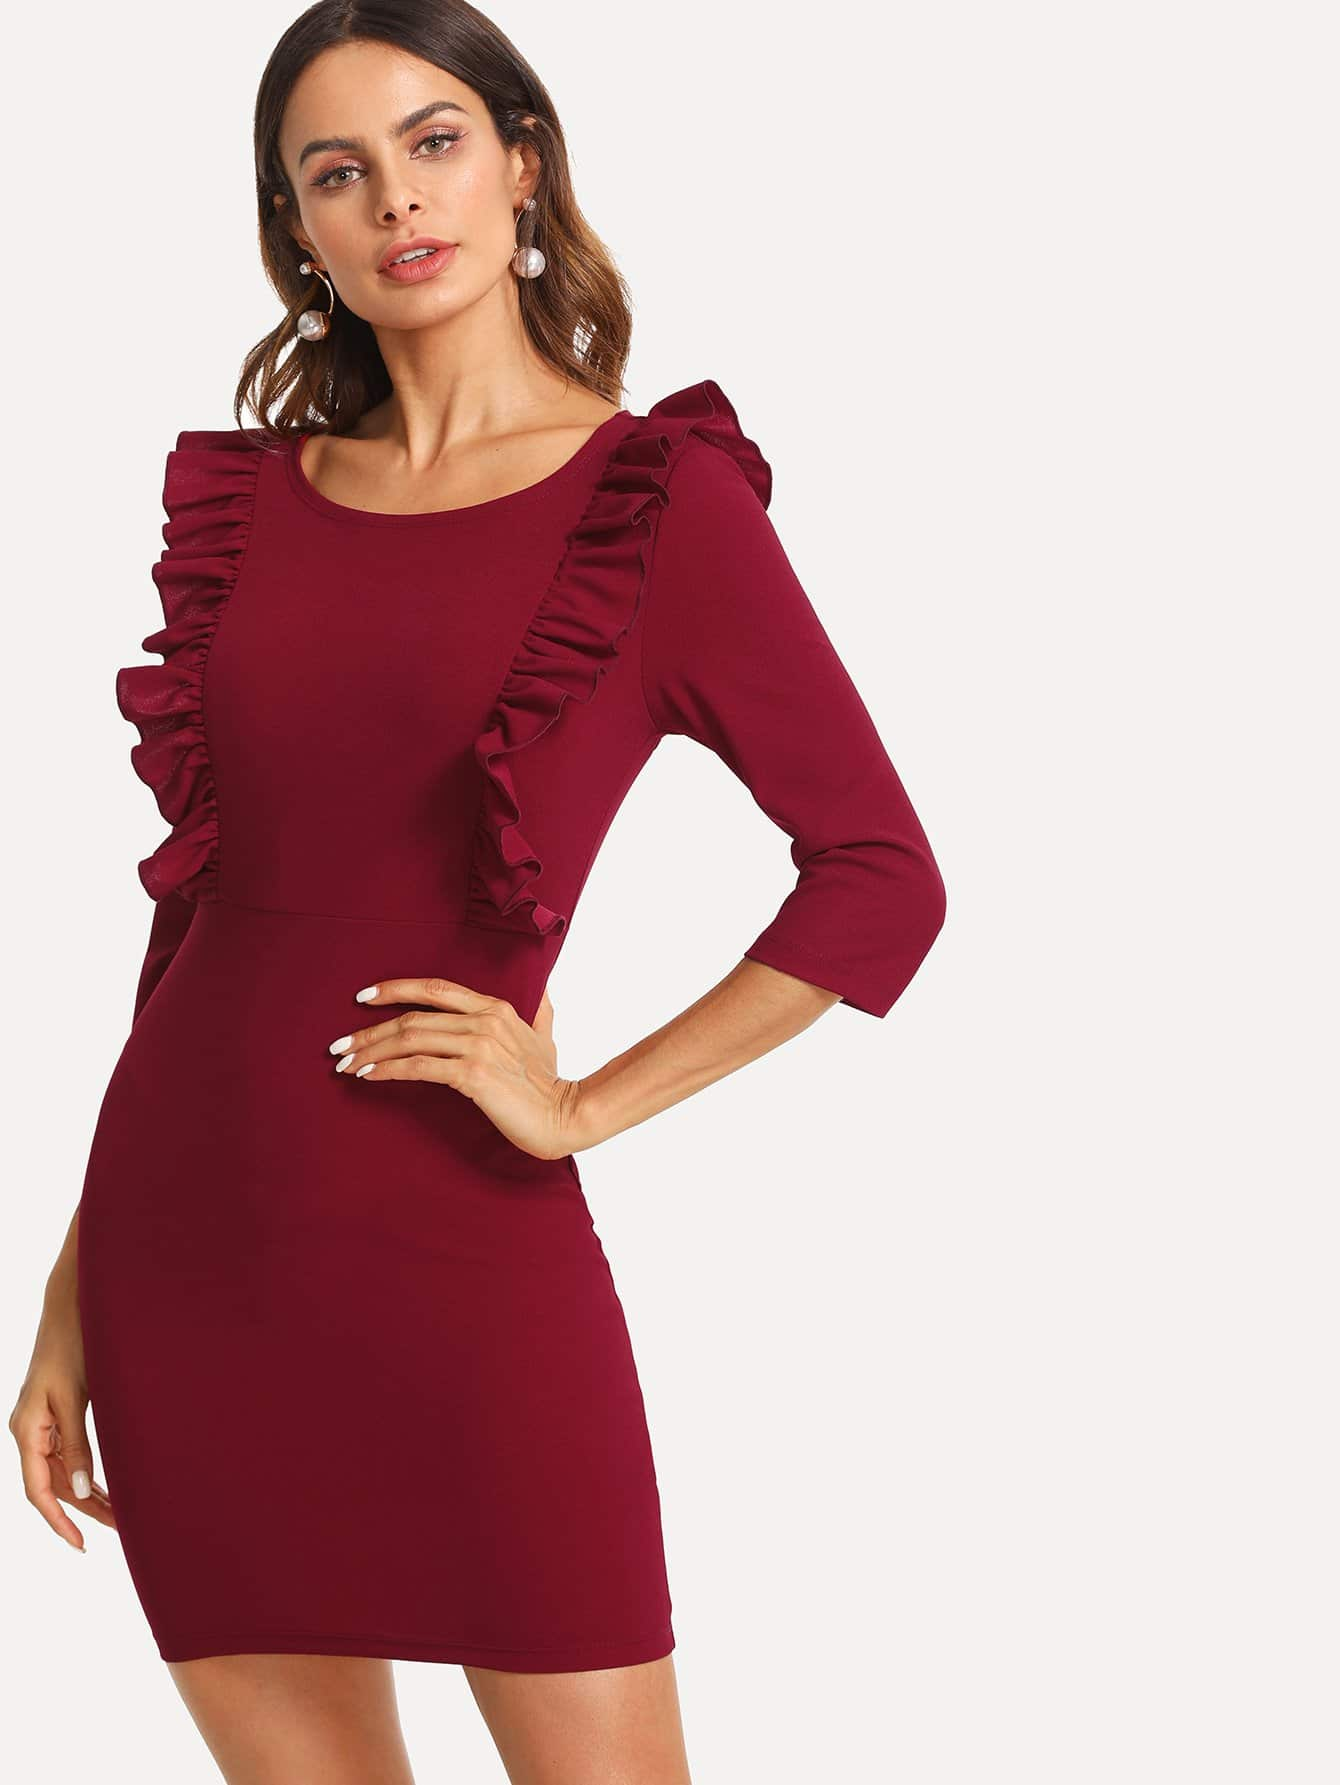 Ruffle Trim Zip Side Dress zip up side plaid dress